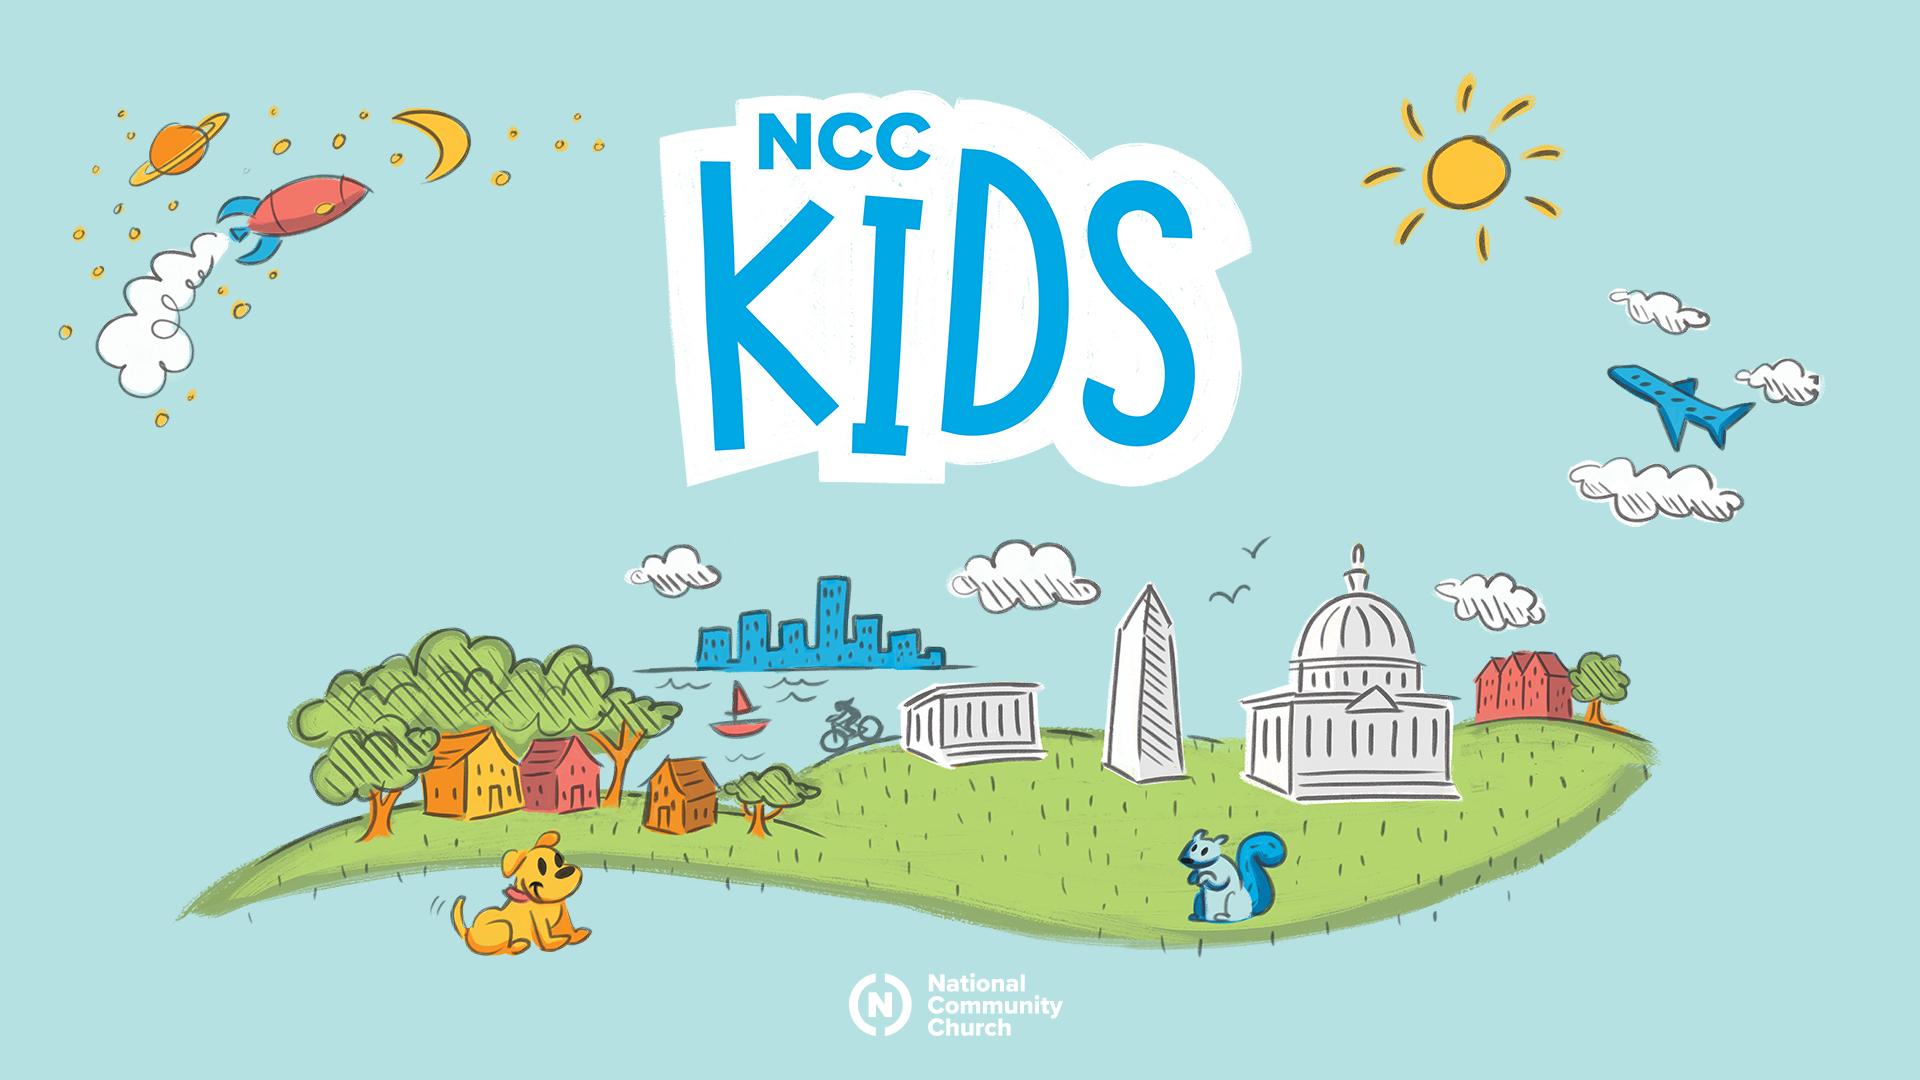 1920x1080 ncc kids sample